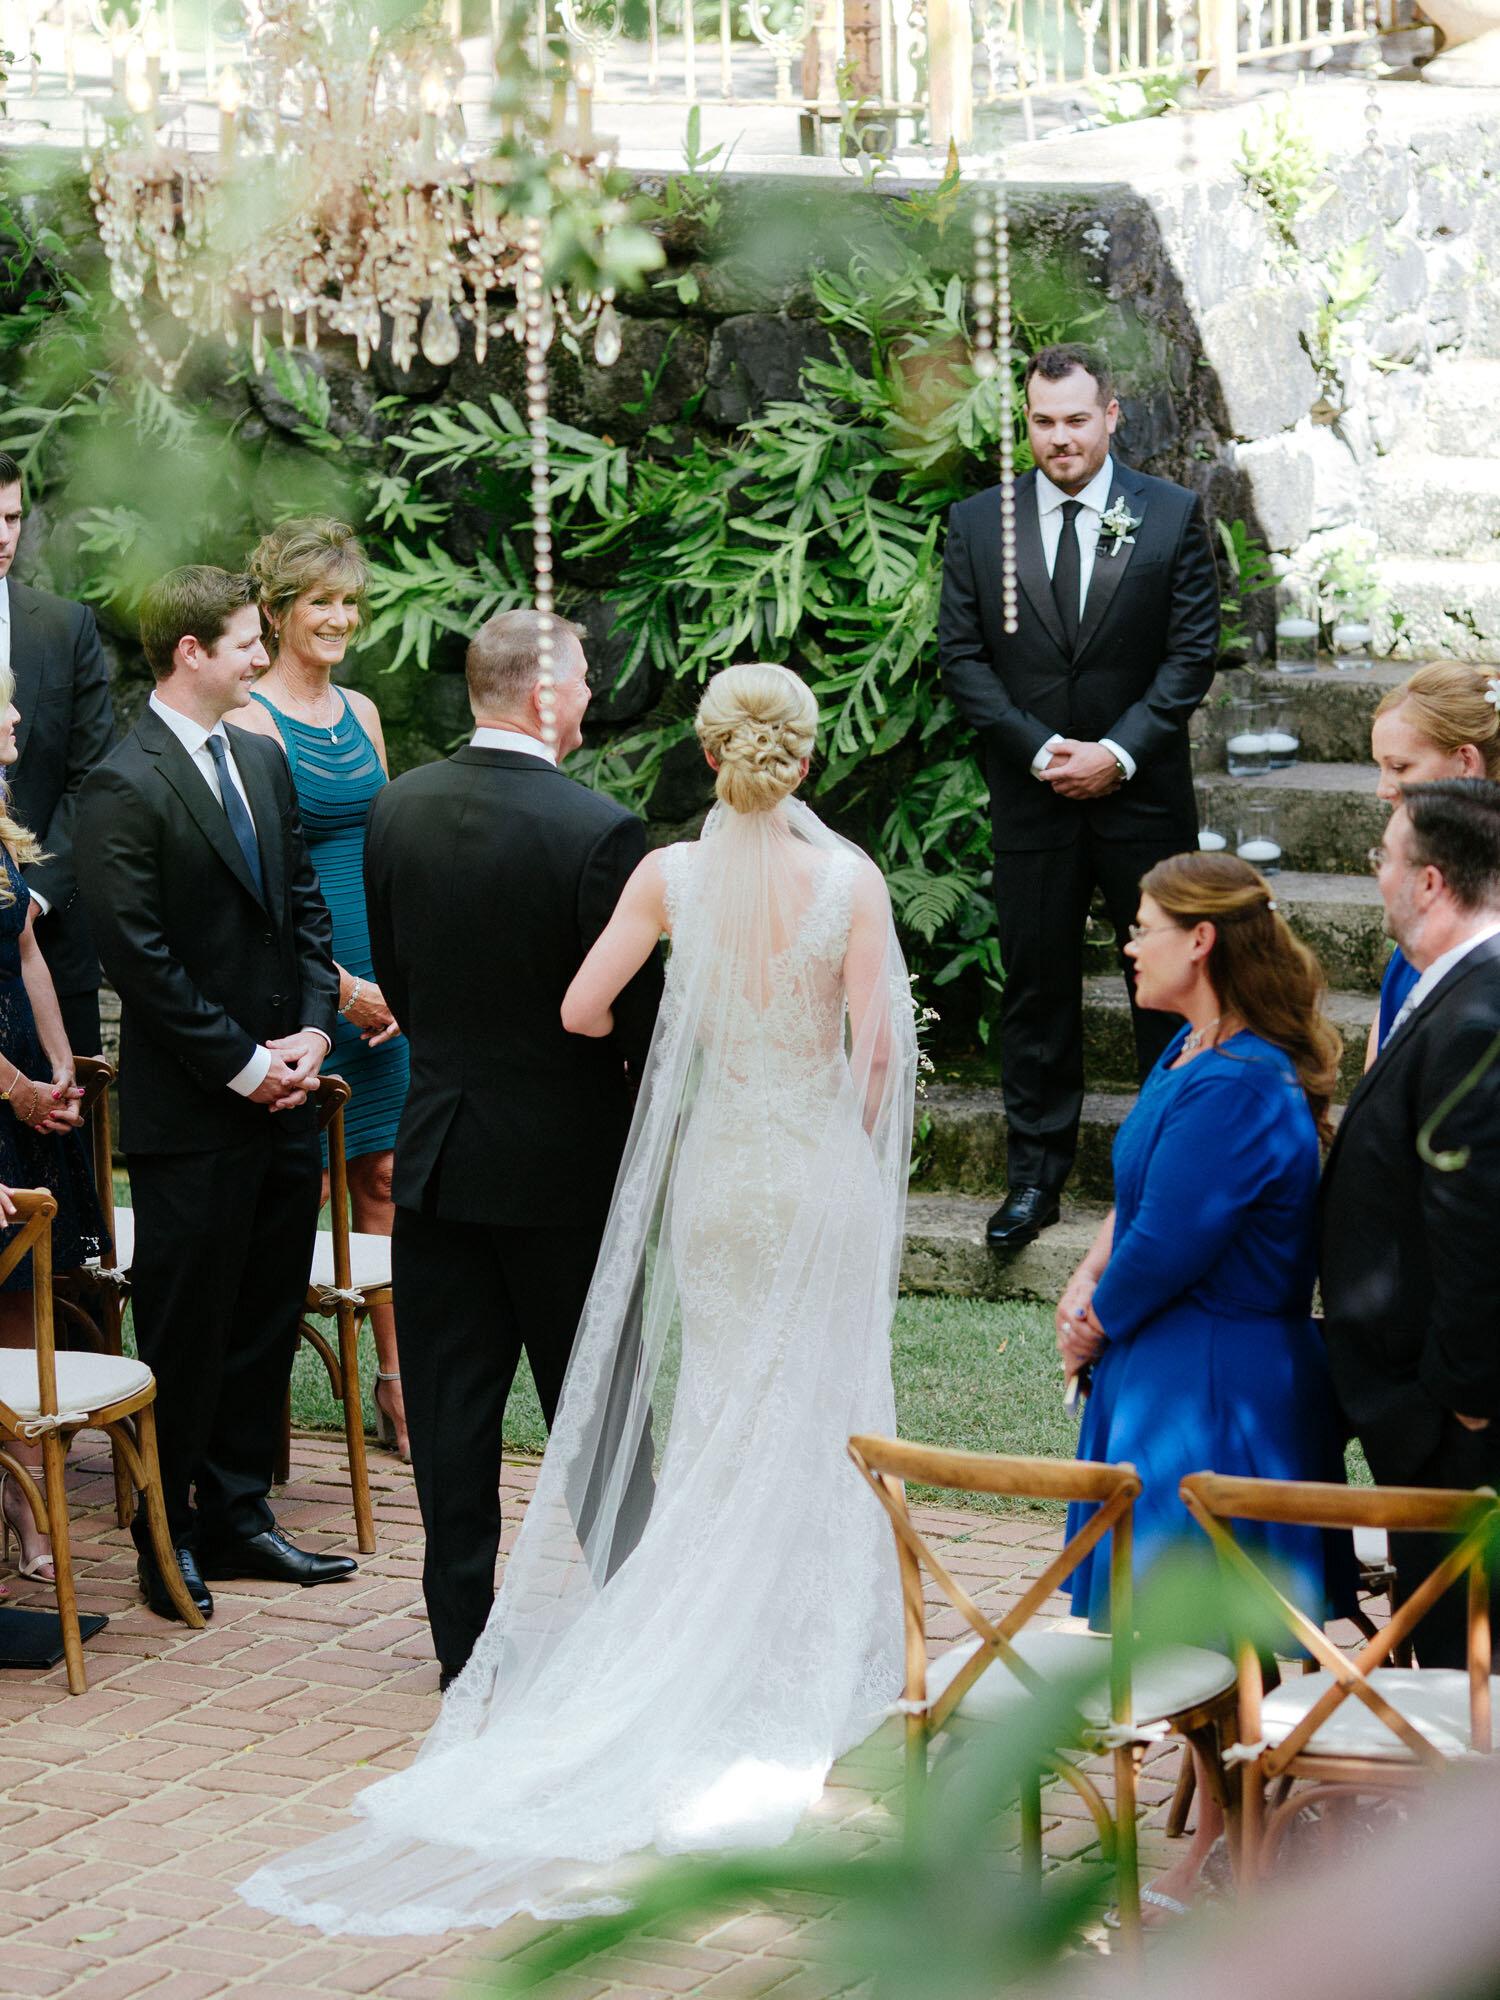 Chris-J-Evans-Maui-Wedding-Kim&Brian2331.jpg